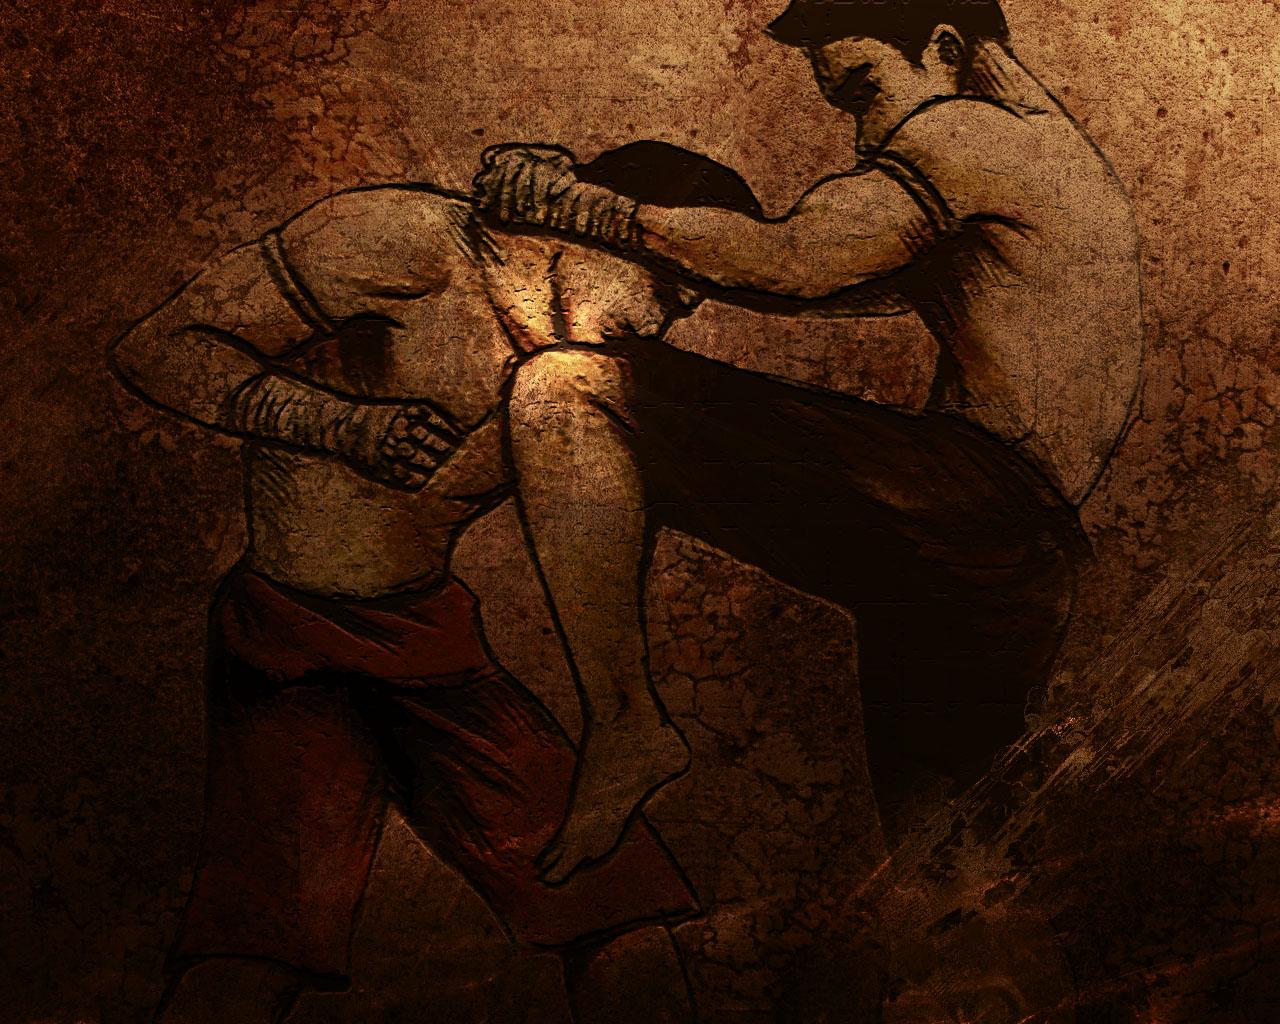 http://1.bp.blogspot.com/-JwtmxTj8YeU/TvoAaaQeluI/AAAAAAAAAOE/Jpa_P3GmZ30/s1600/Muay-Thai-boxing-Wallpaper-6.jpg